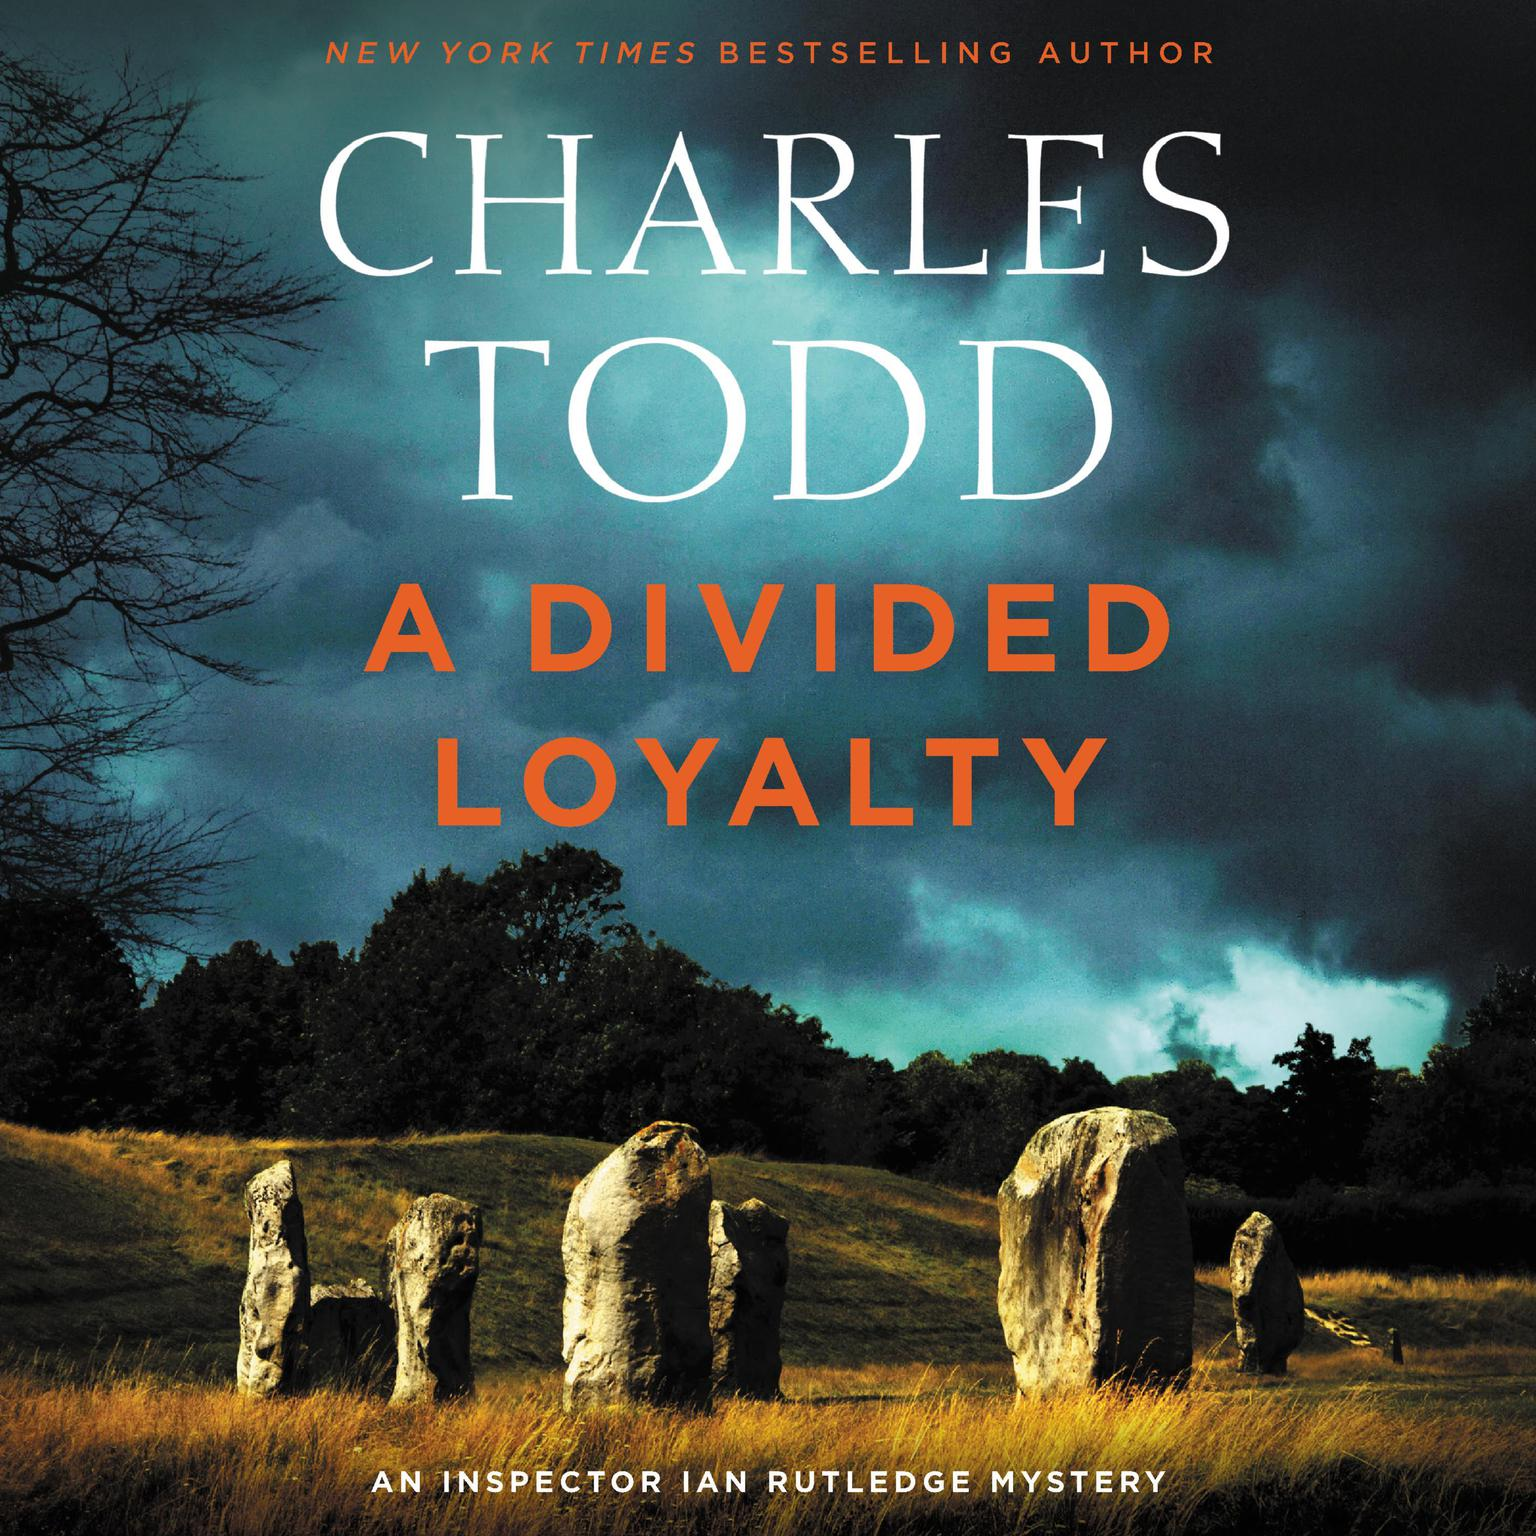 Printable A Divided Loyalty: A Novel Audiobook Cover Art